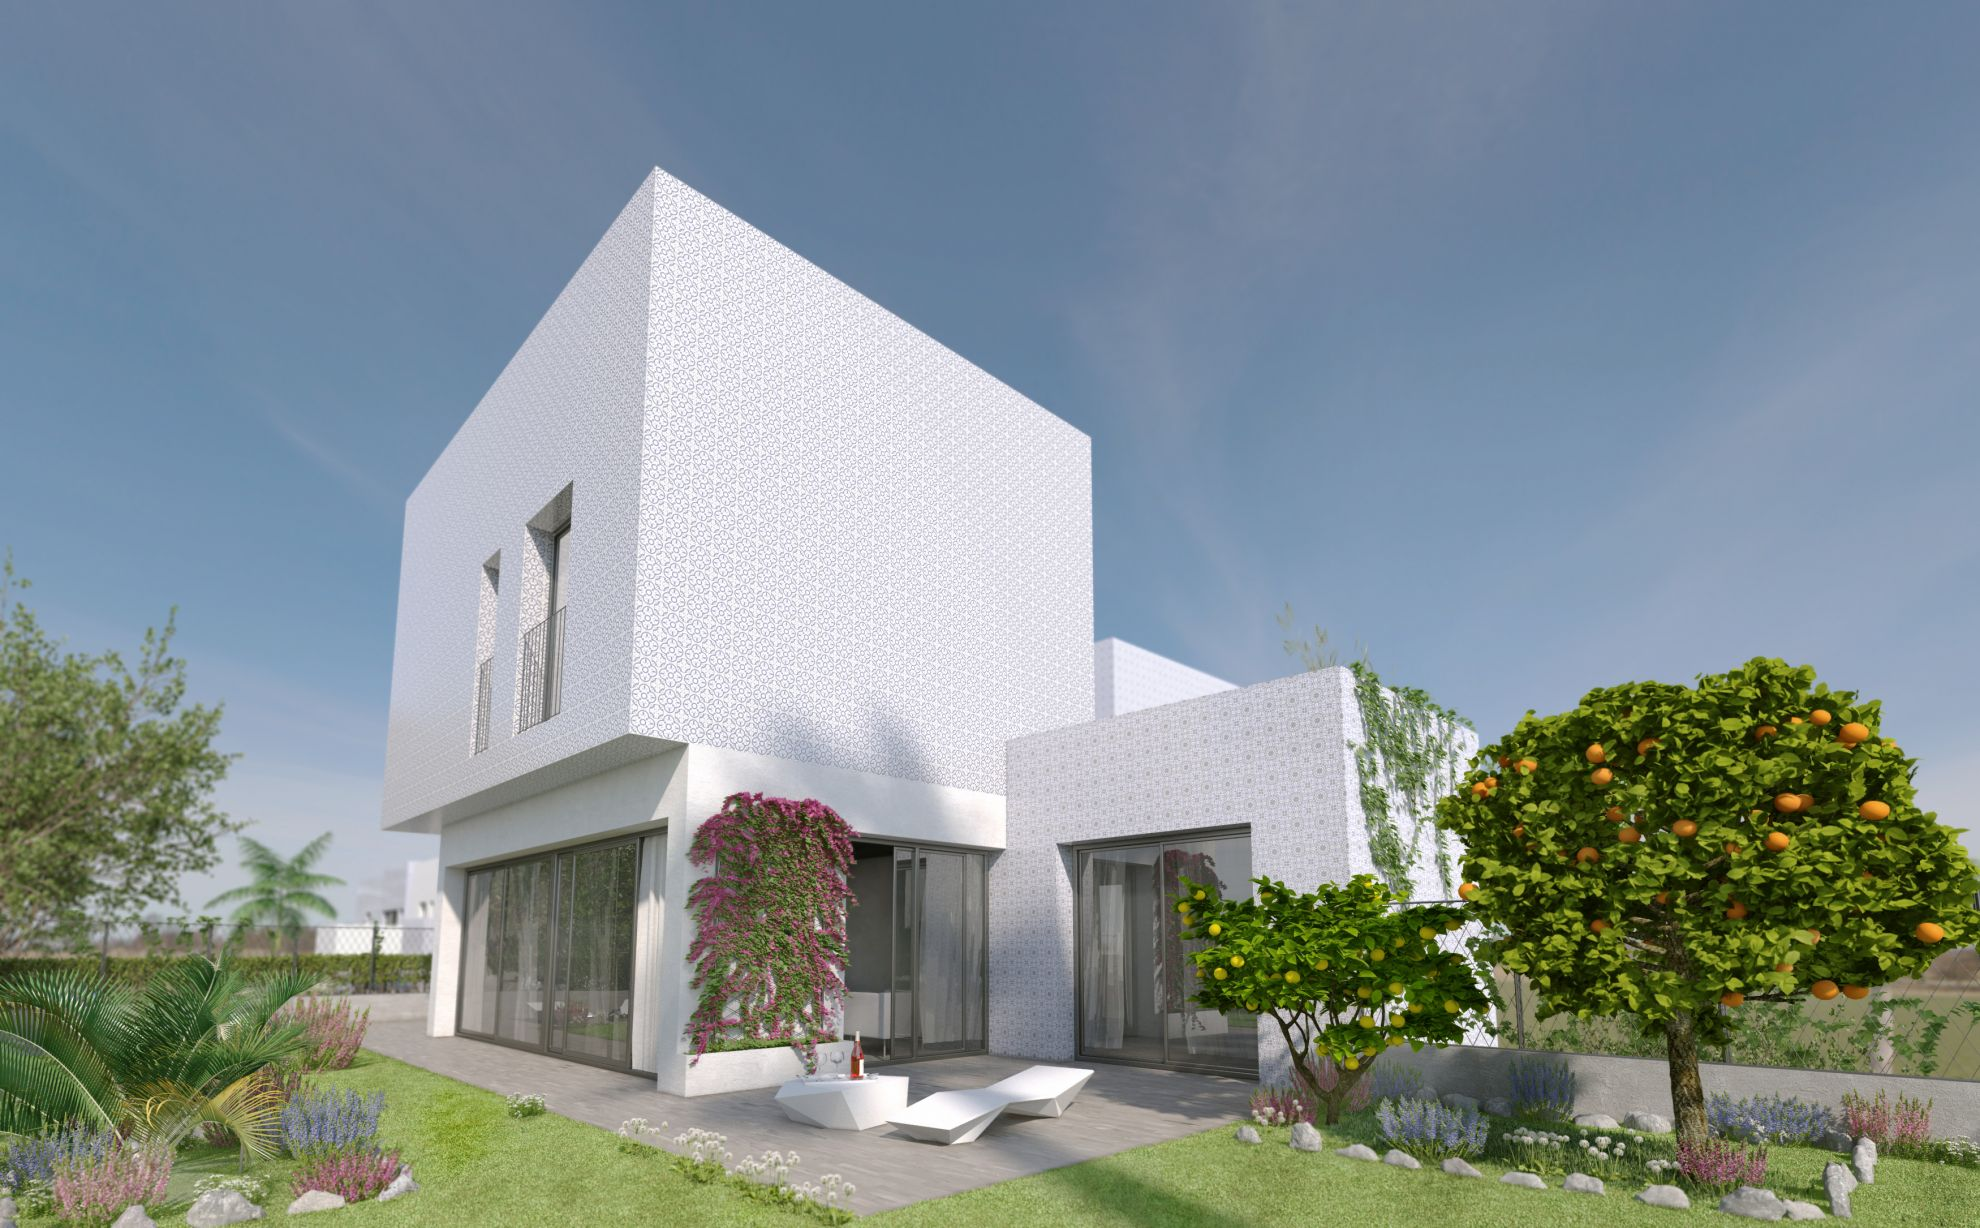 3 bedroom villa with private garden in complex with pool in Villamartín 6